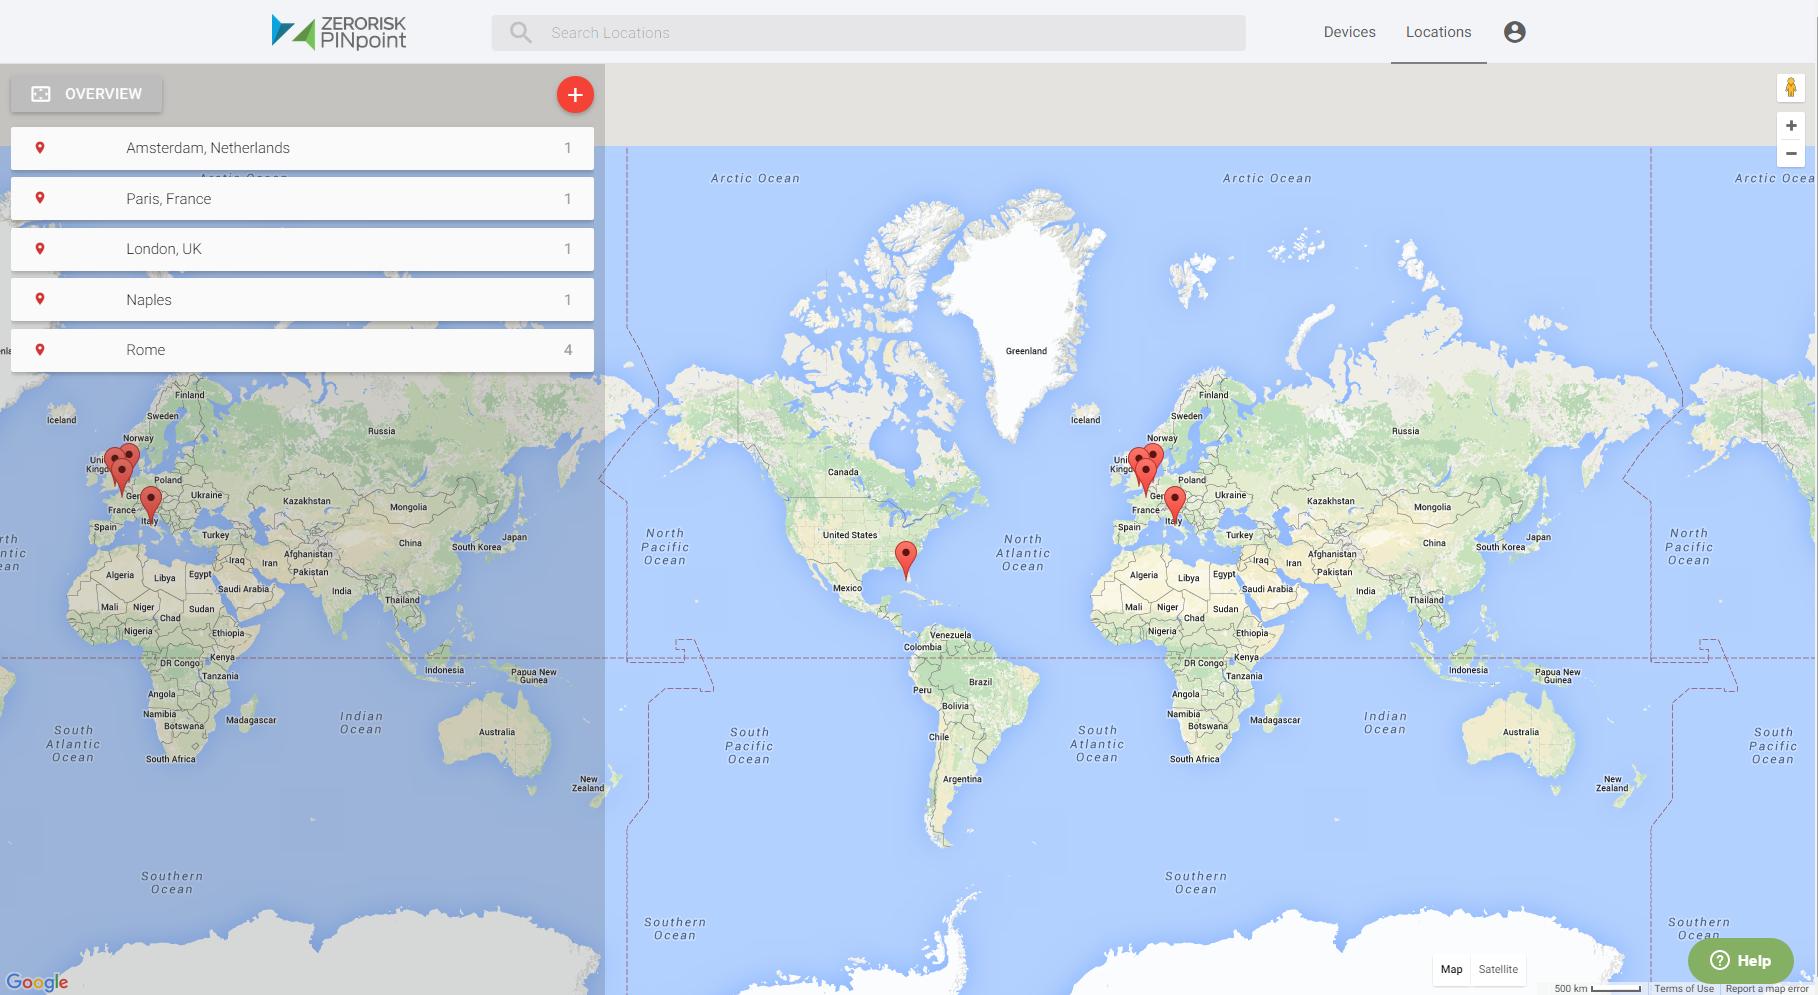 ZeroRisk PINpoint Locations Overview